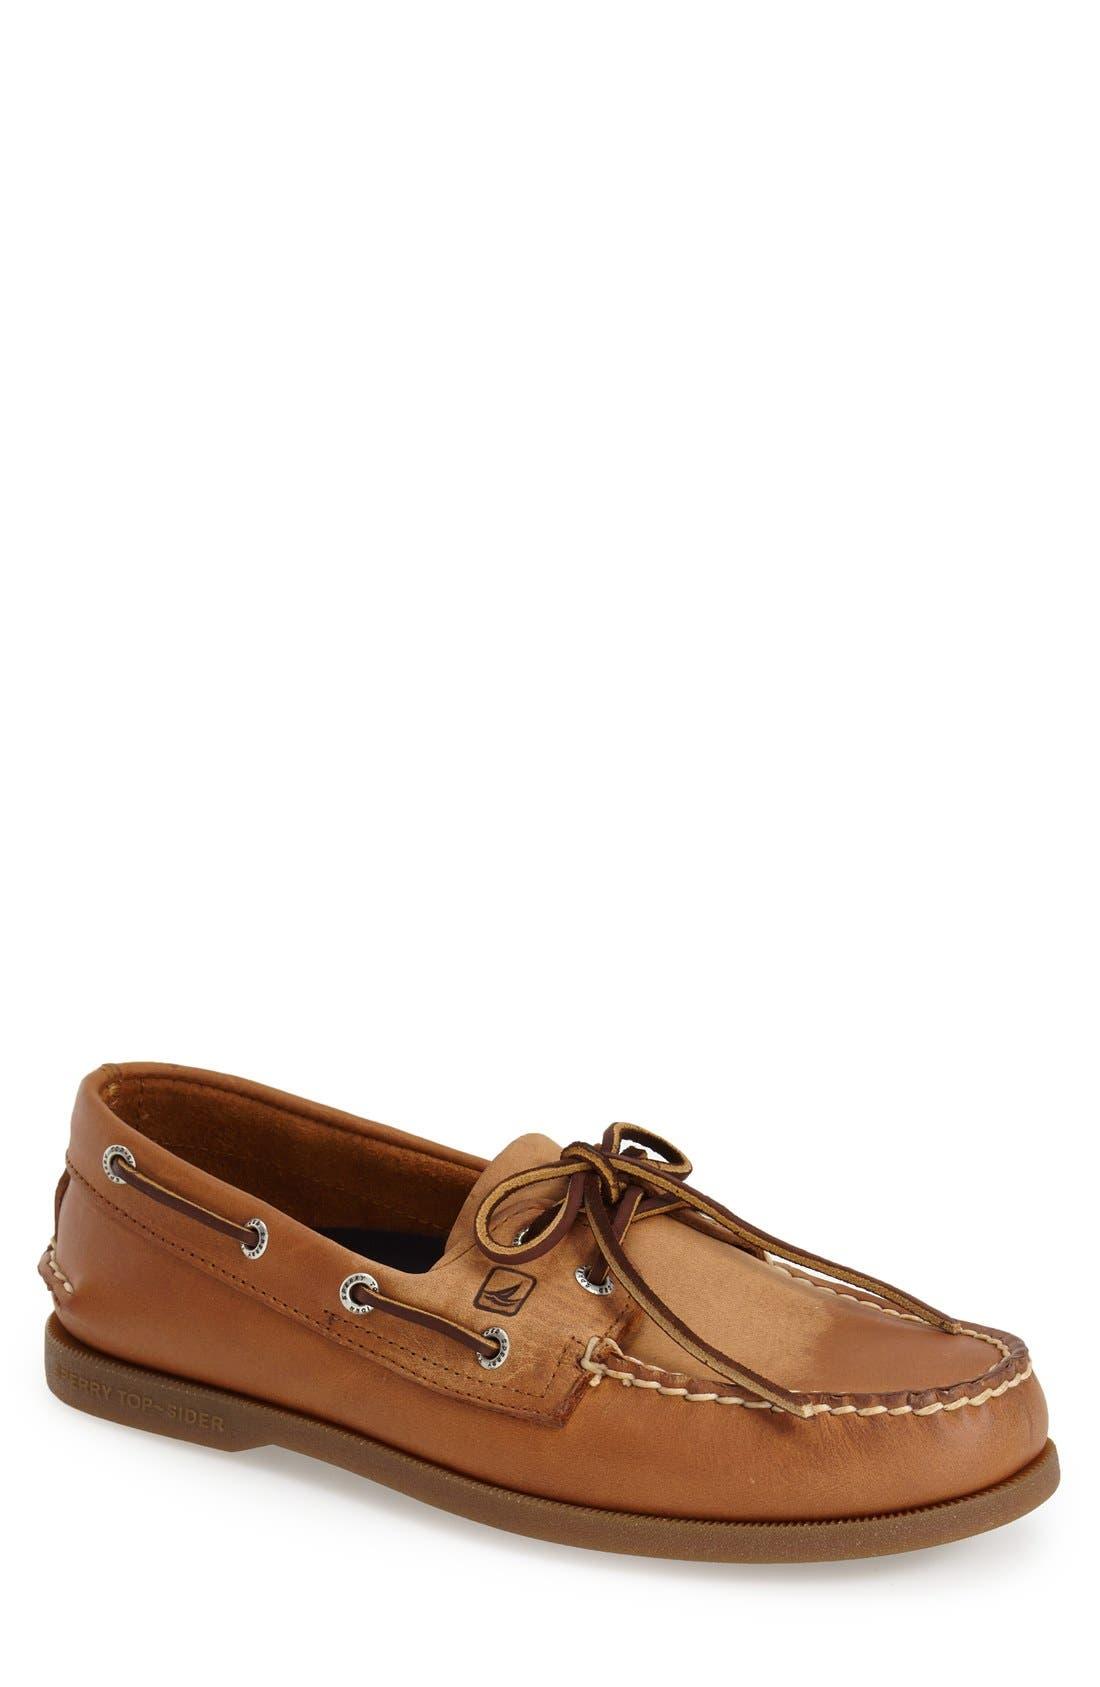 Sperry 'Authentic Original' Boat Shoe (Men)